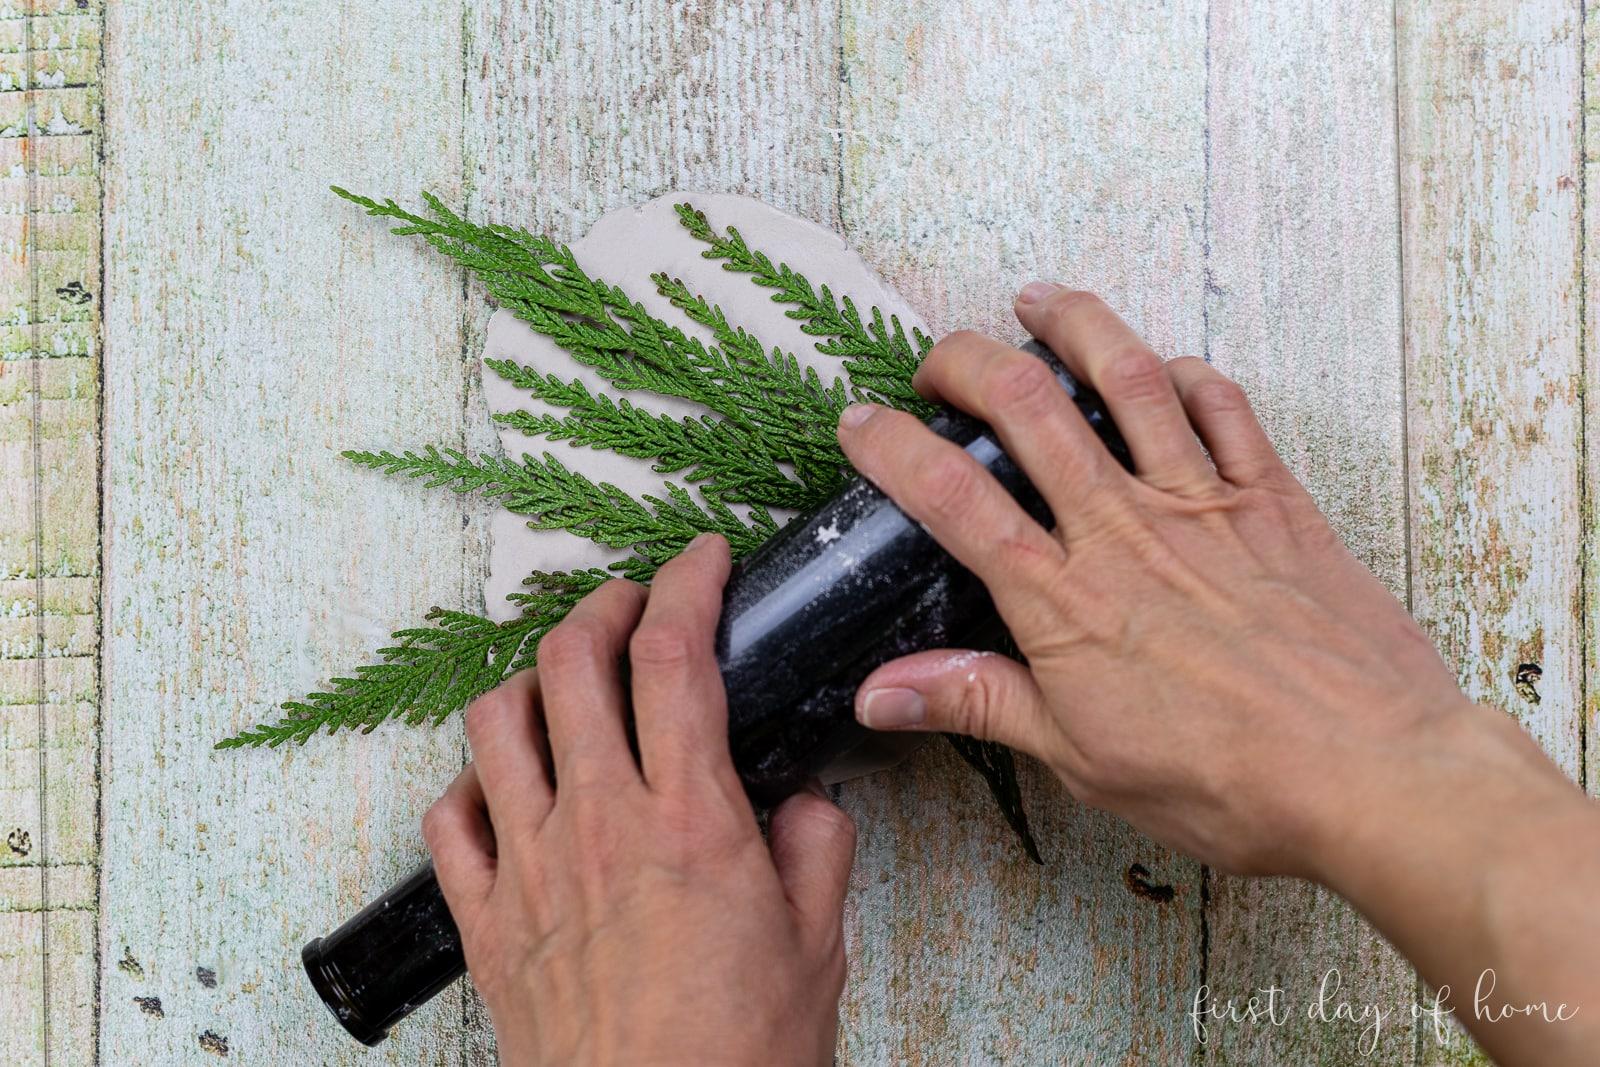 Imprinting a stem onto air dry clay